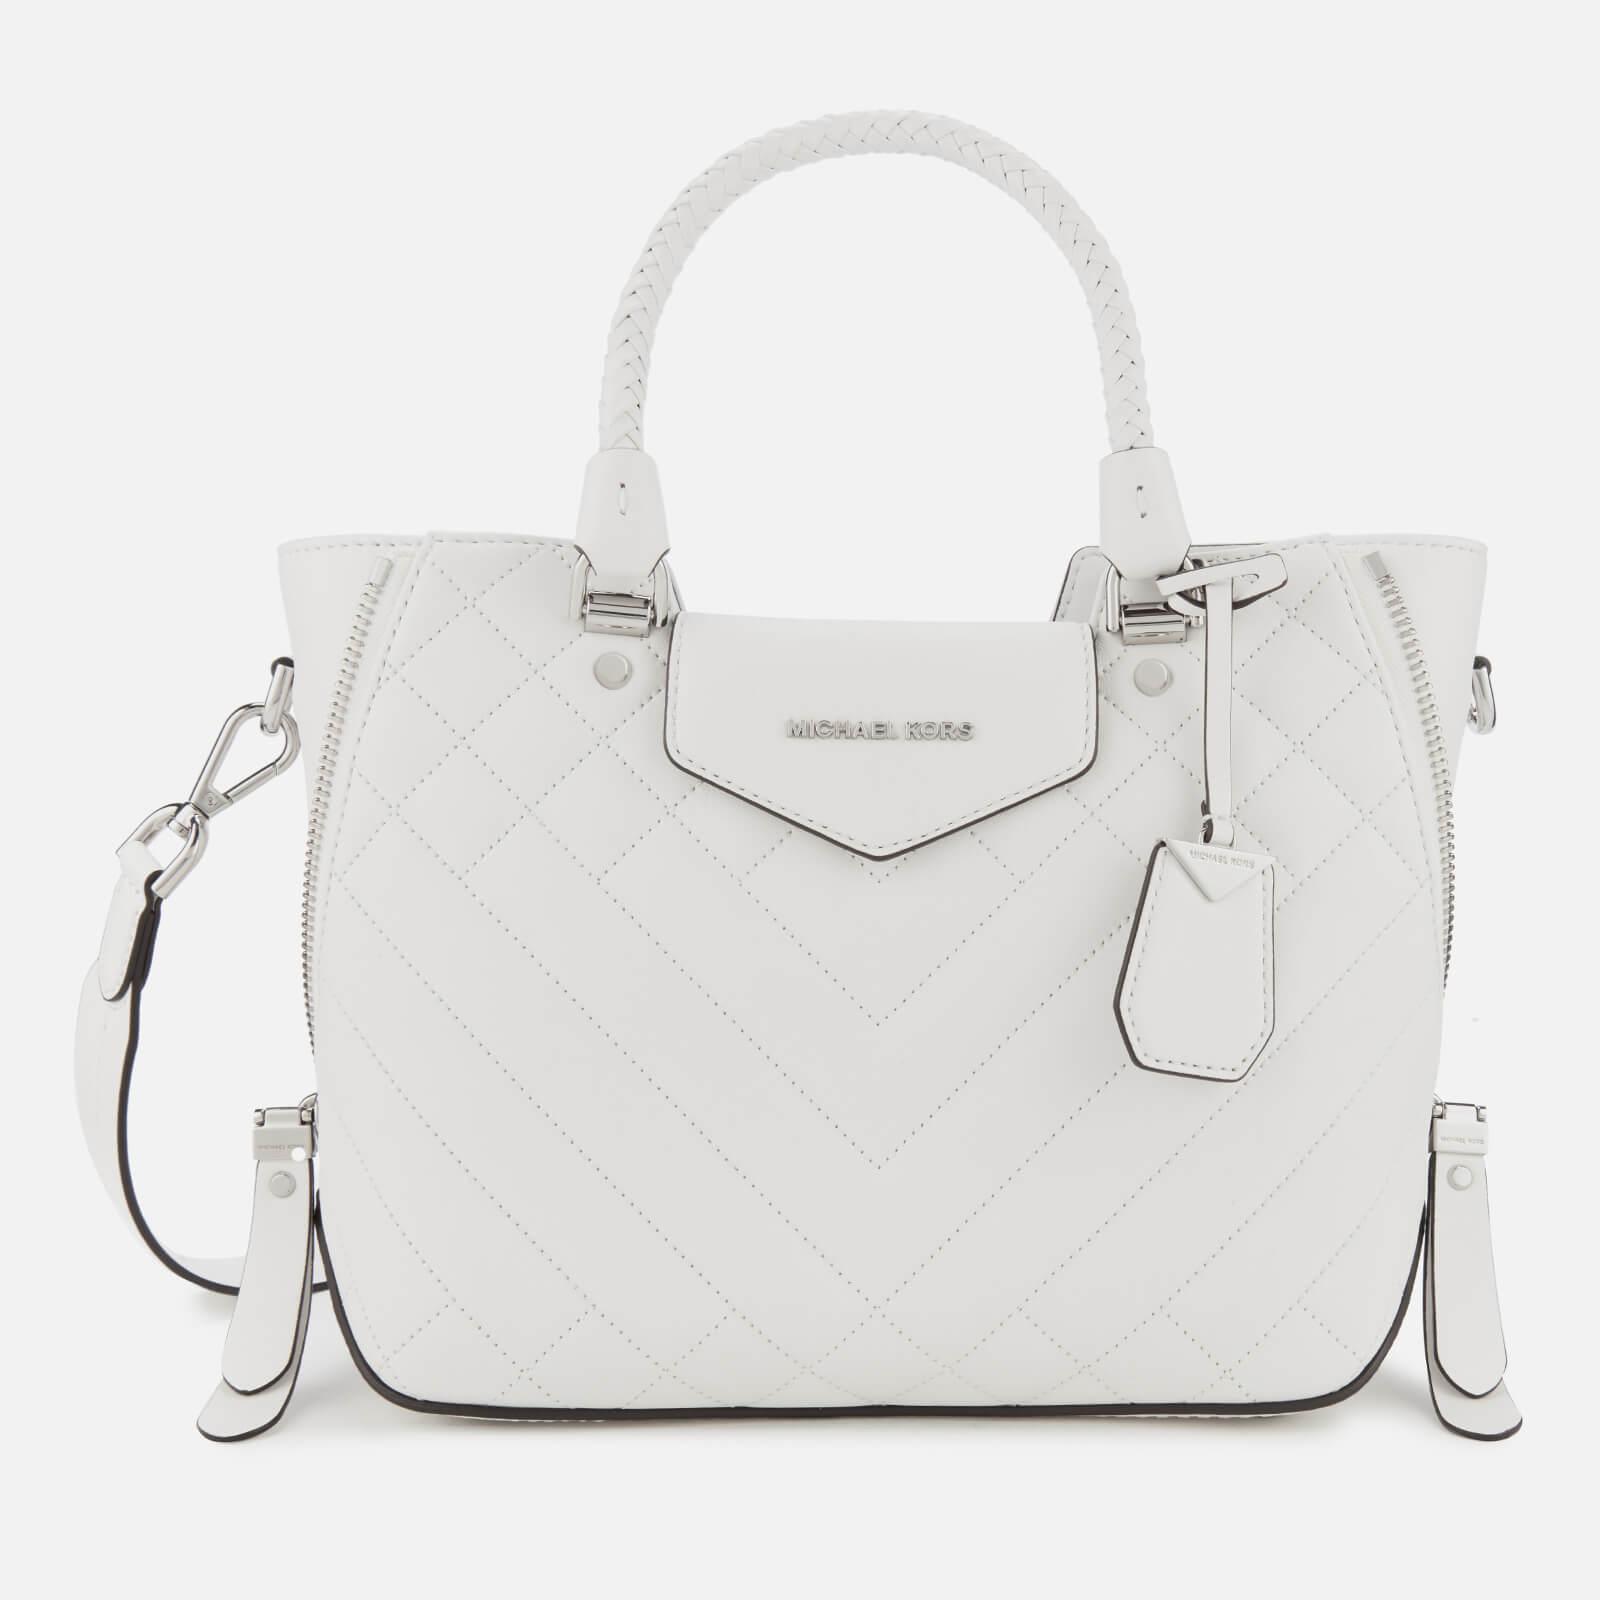 51d2aa840b4c MICHAEL MICHAEL KORS Women's Blakely Medium Messenger Bag - Optic White  Womens Accessories | TheHut.com